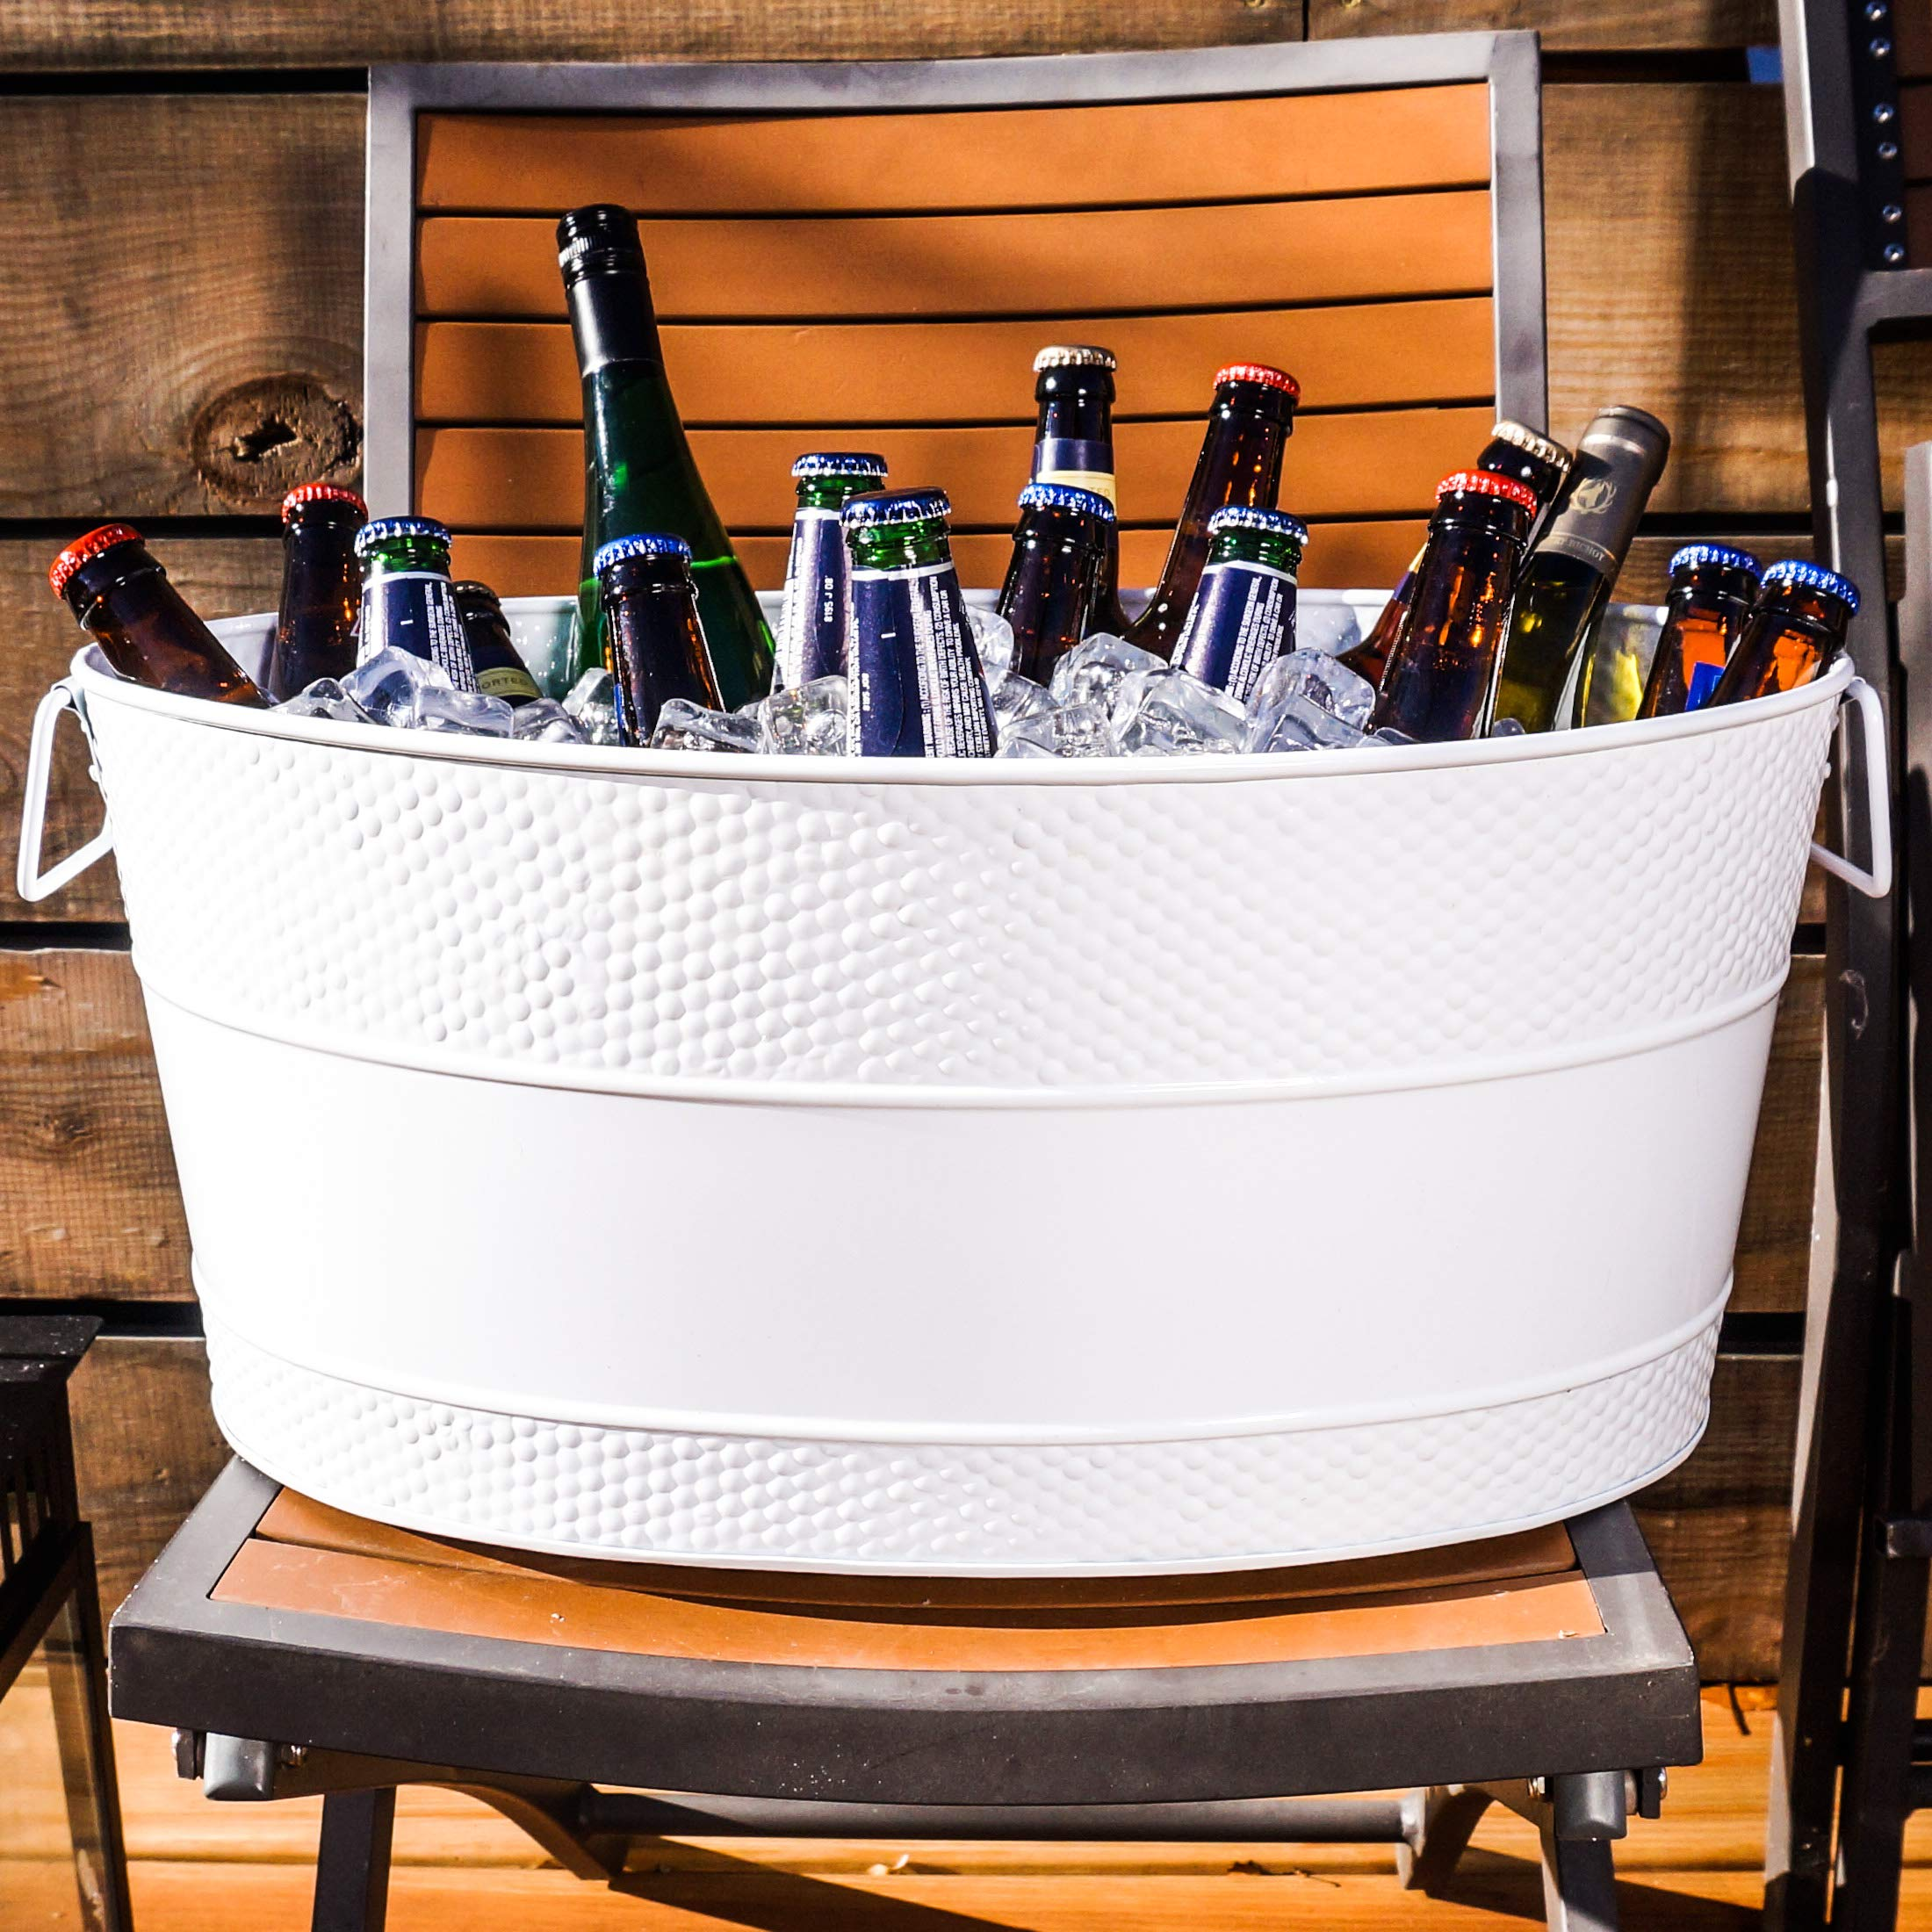 BREKX White Aspen Hammered Galvanized Beverage Tub W/Iron Stand - 25 Quart